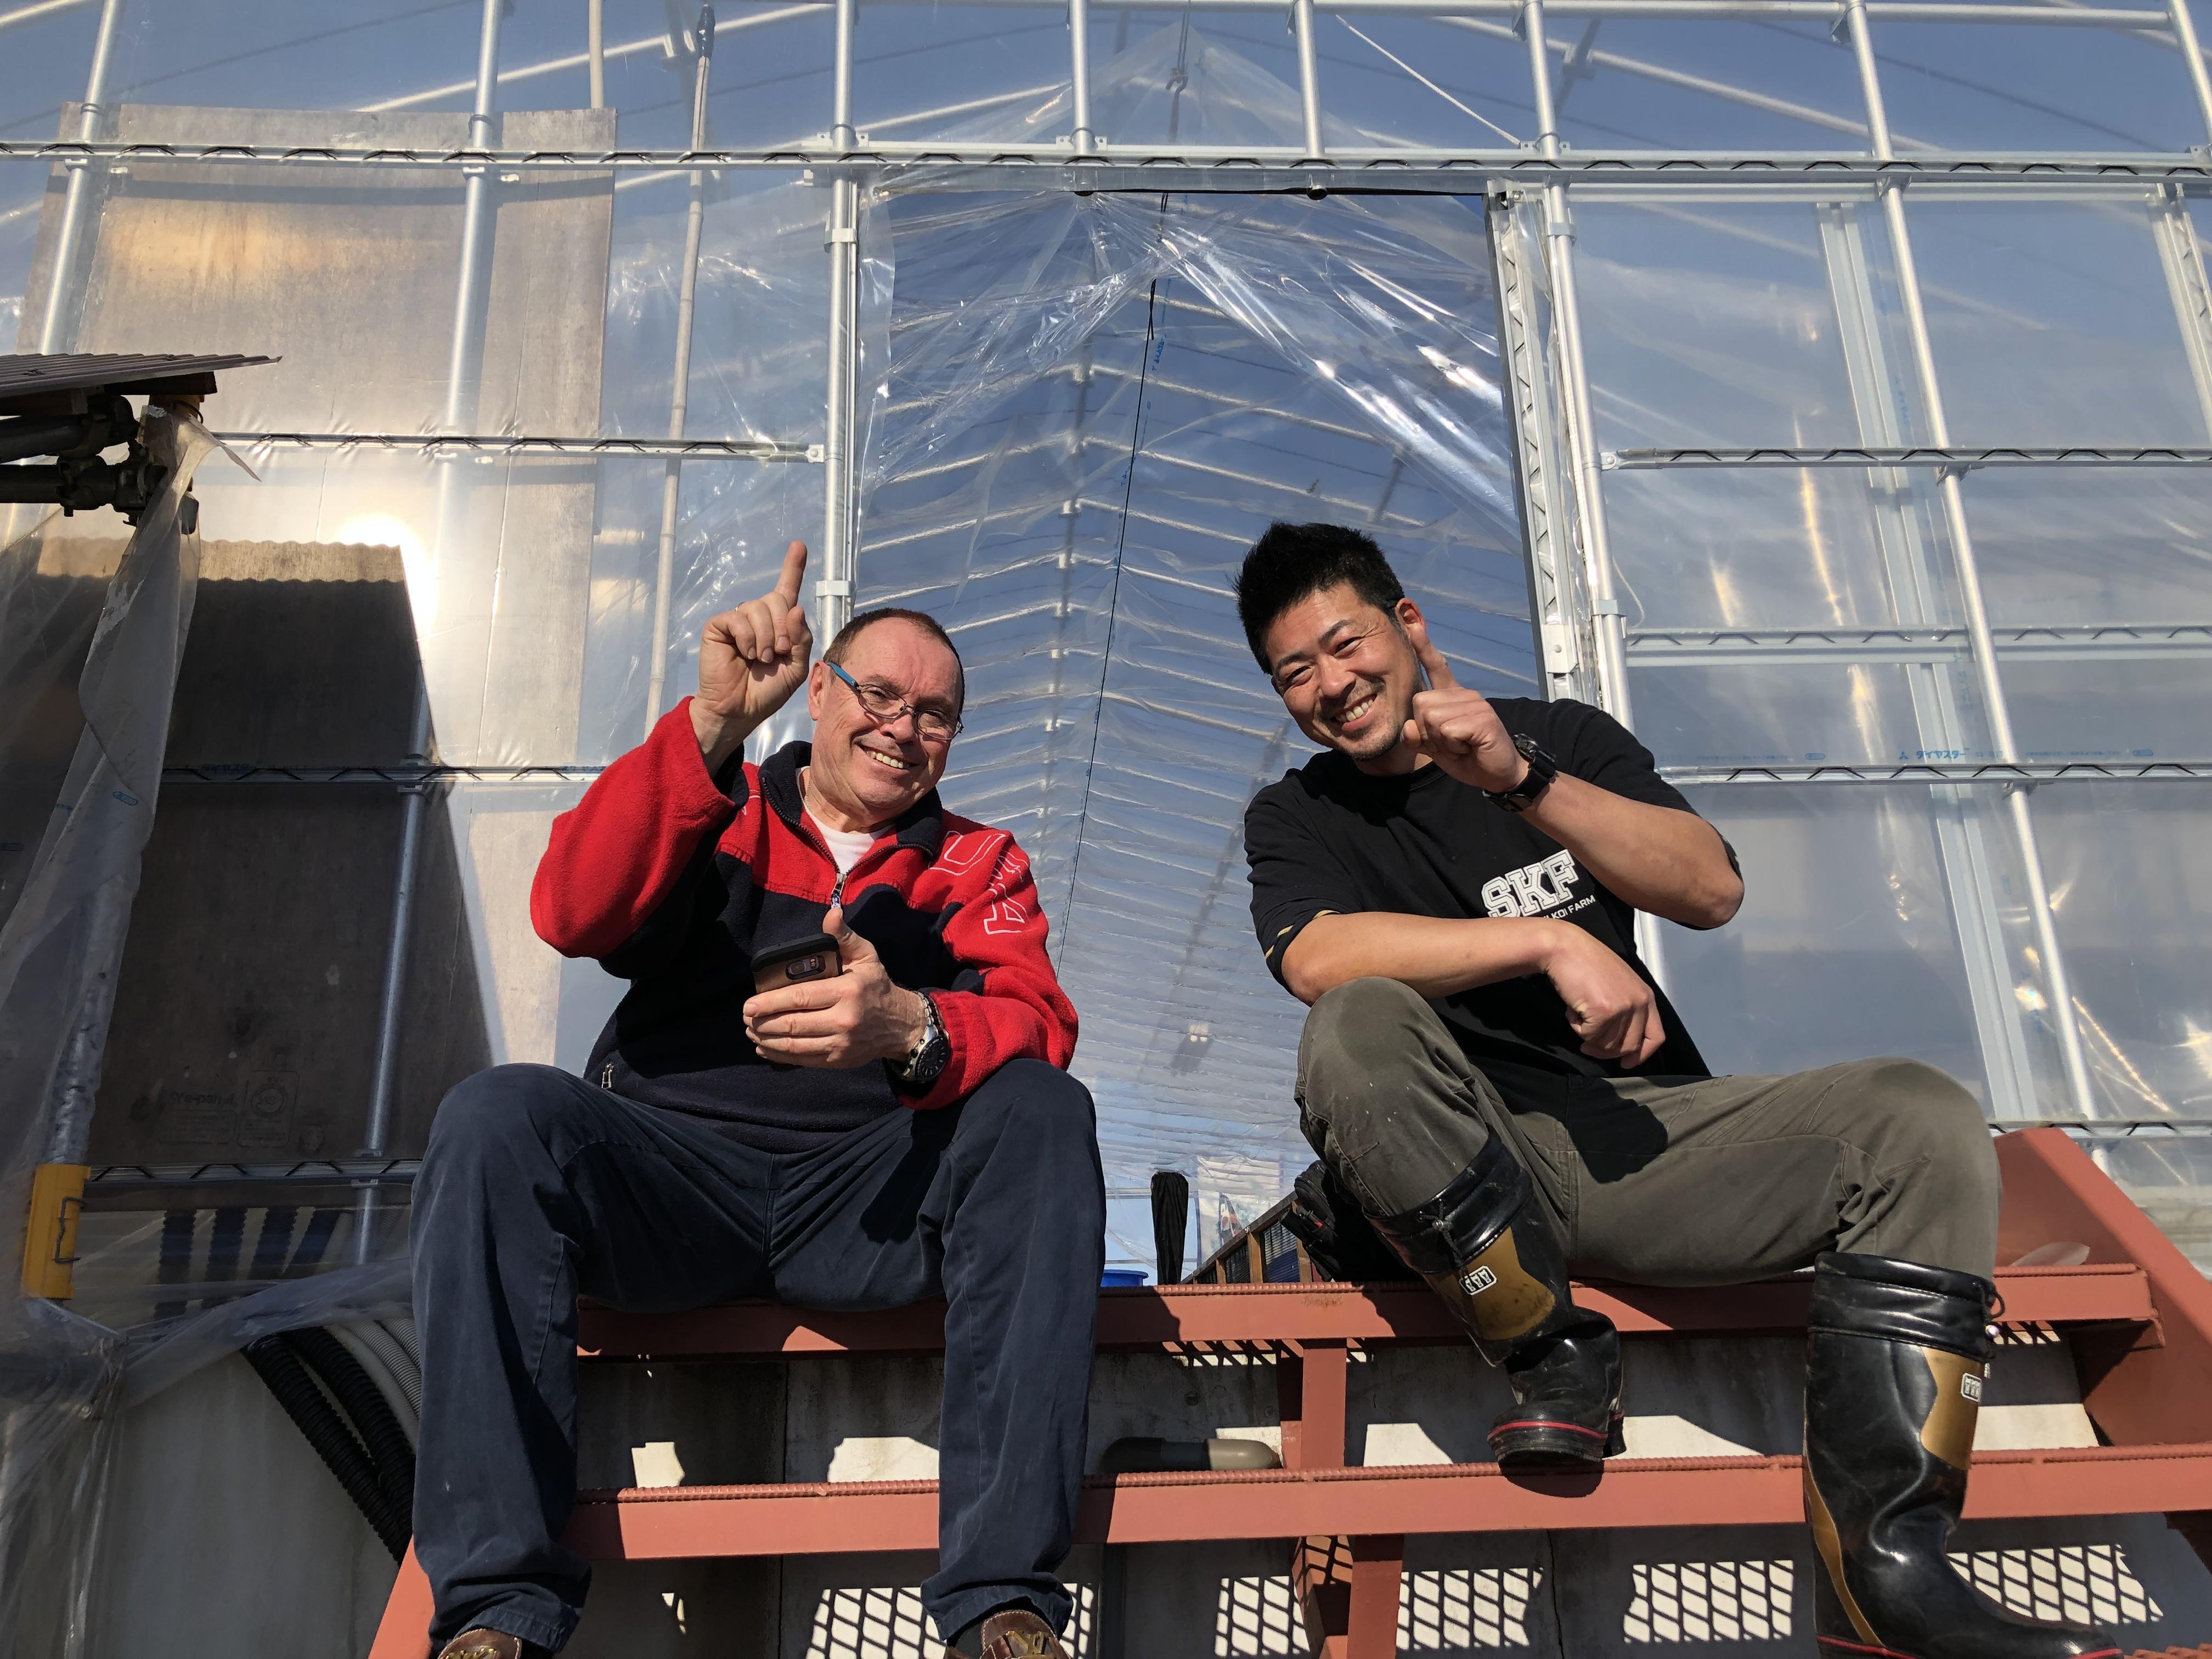 Michel Capot with Masayuki Sekiguchi